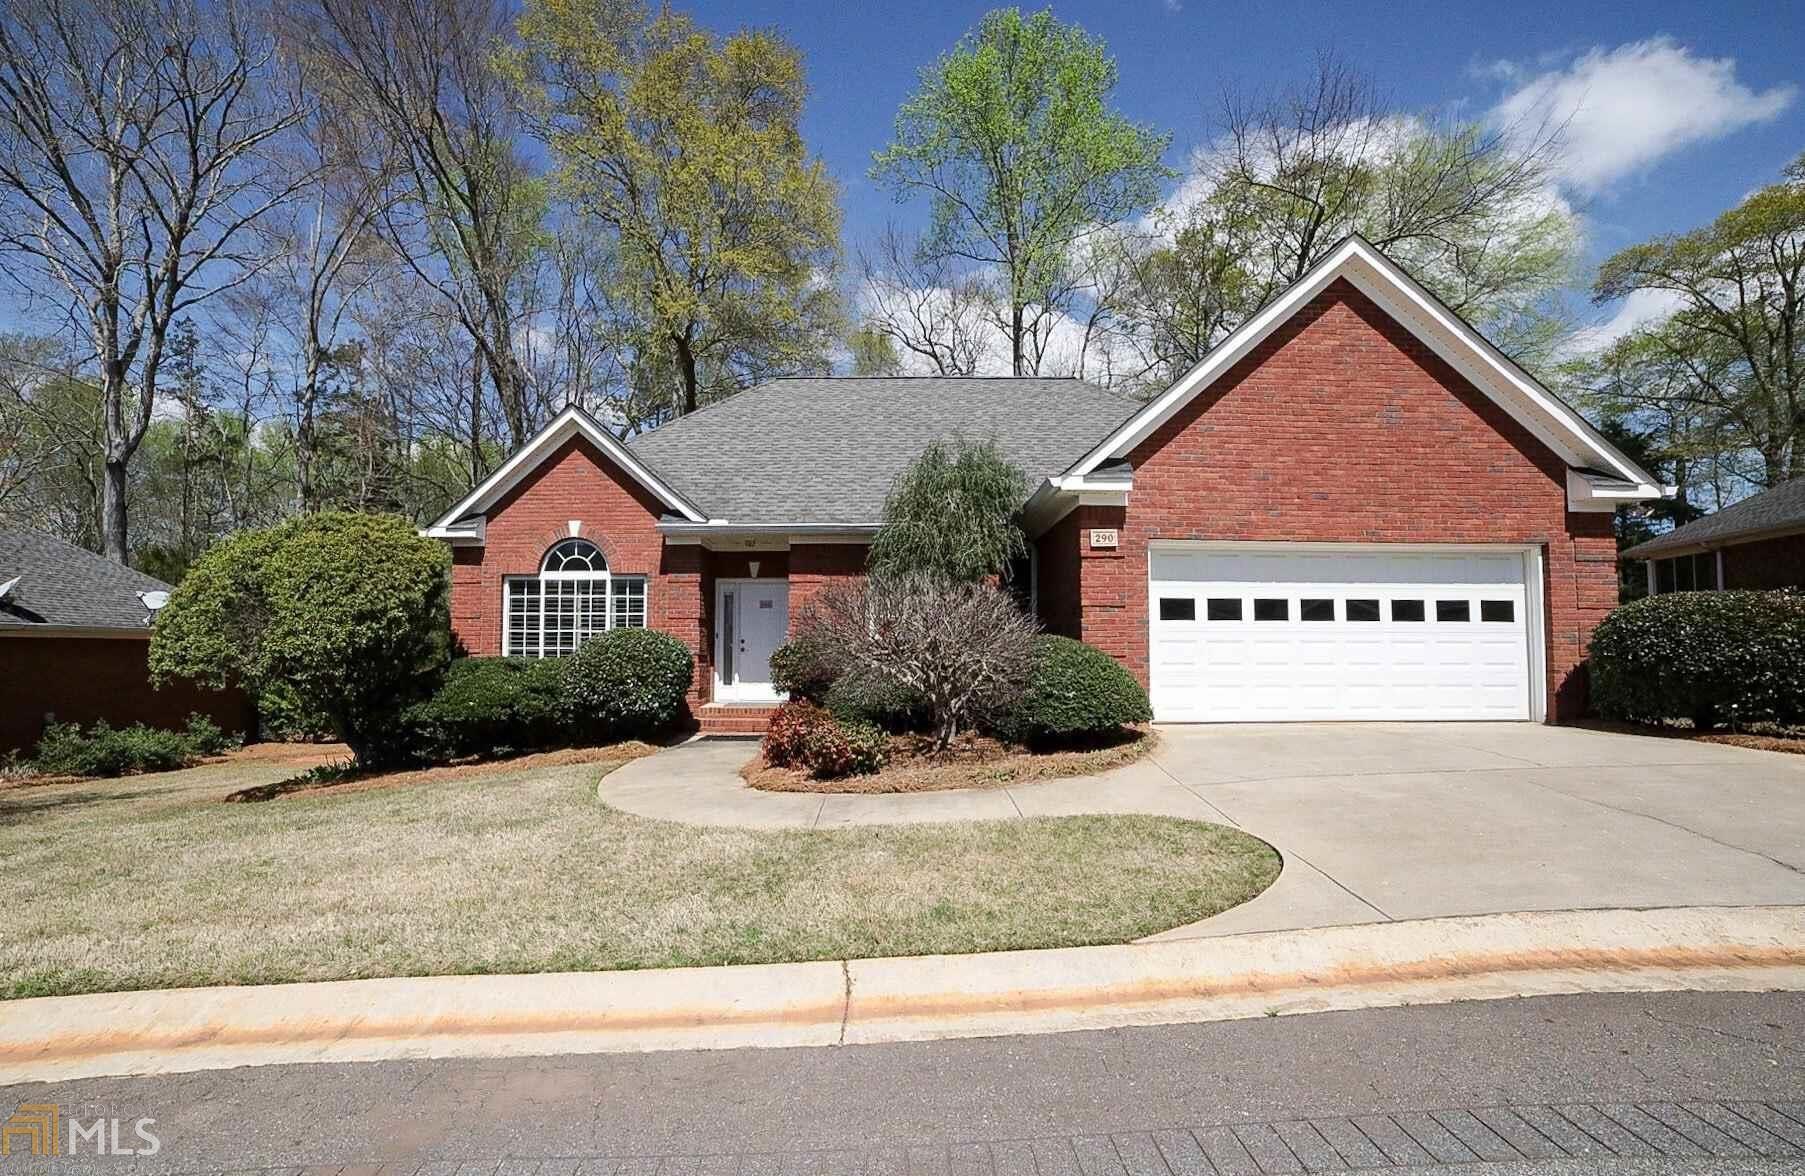 3131 Rocky Branch Rd, Watkinsville, GA 30677 - #: 8761655